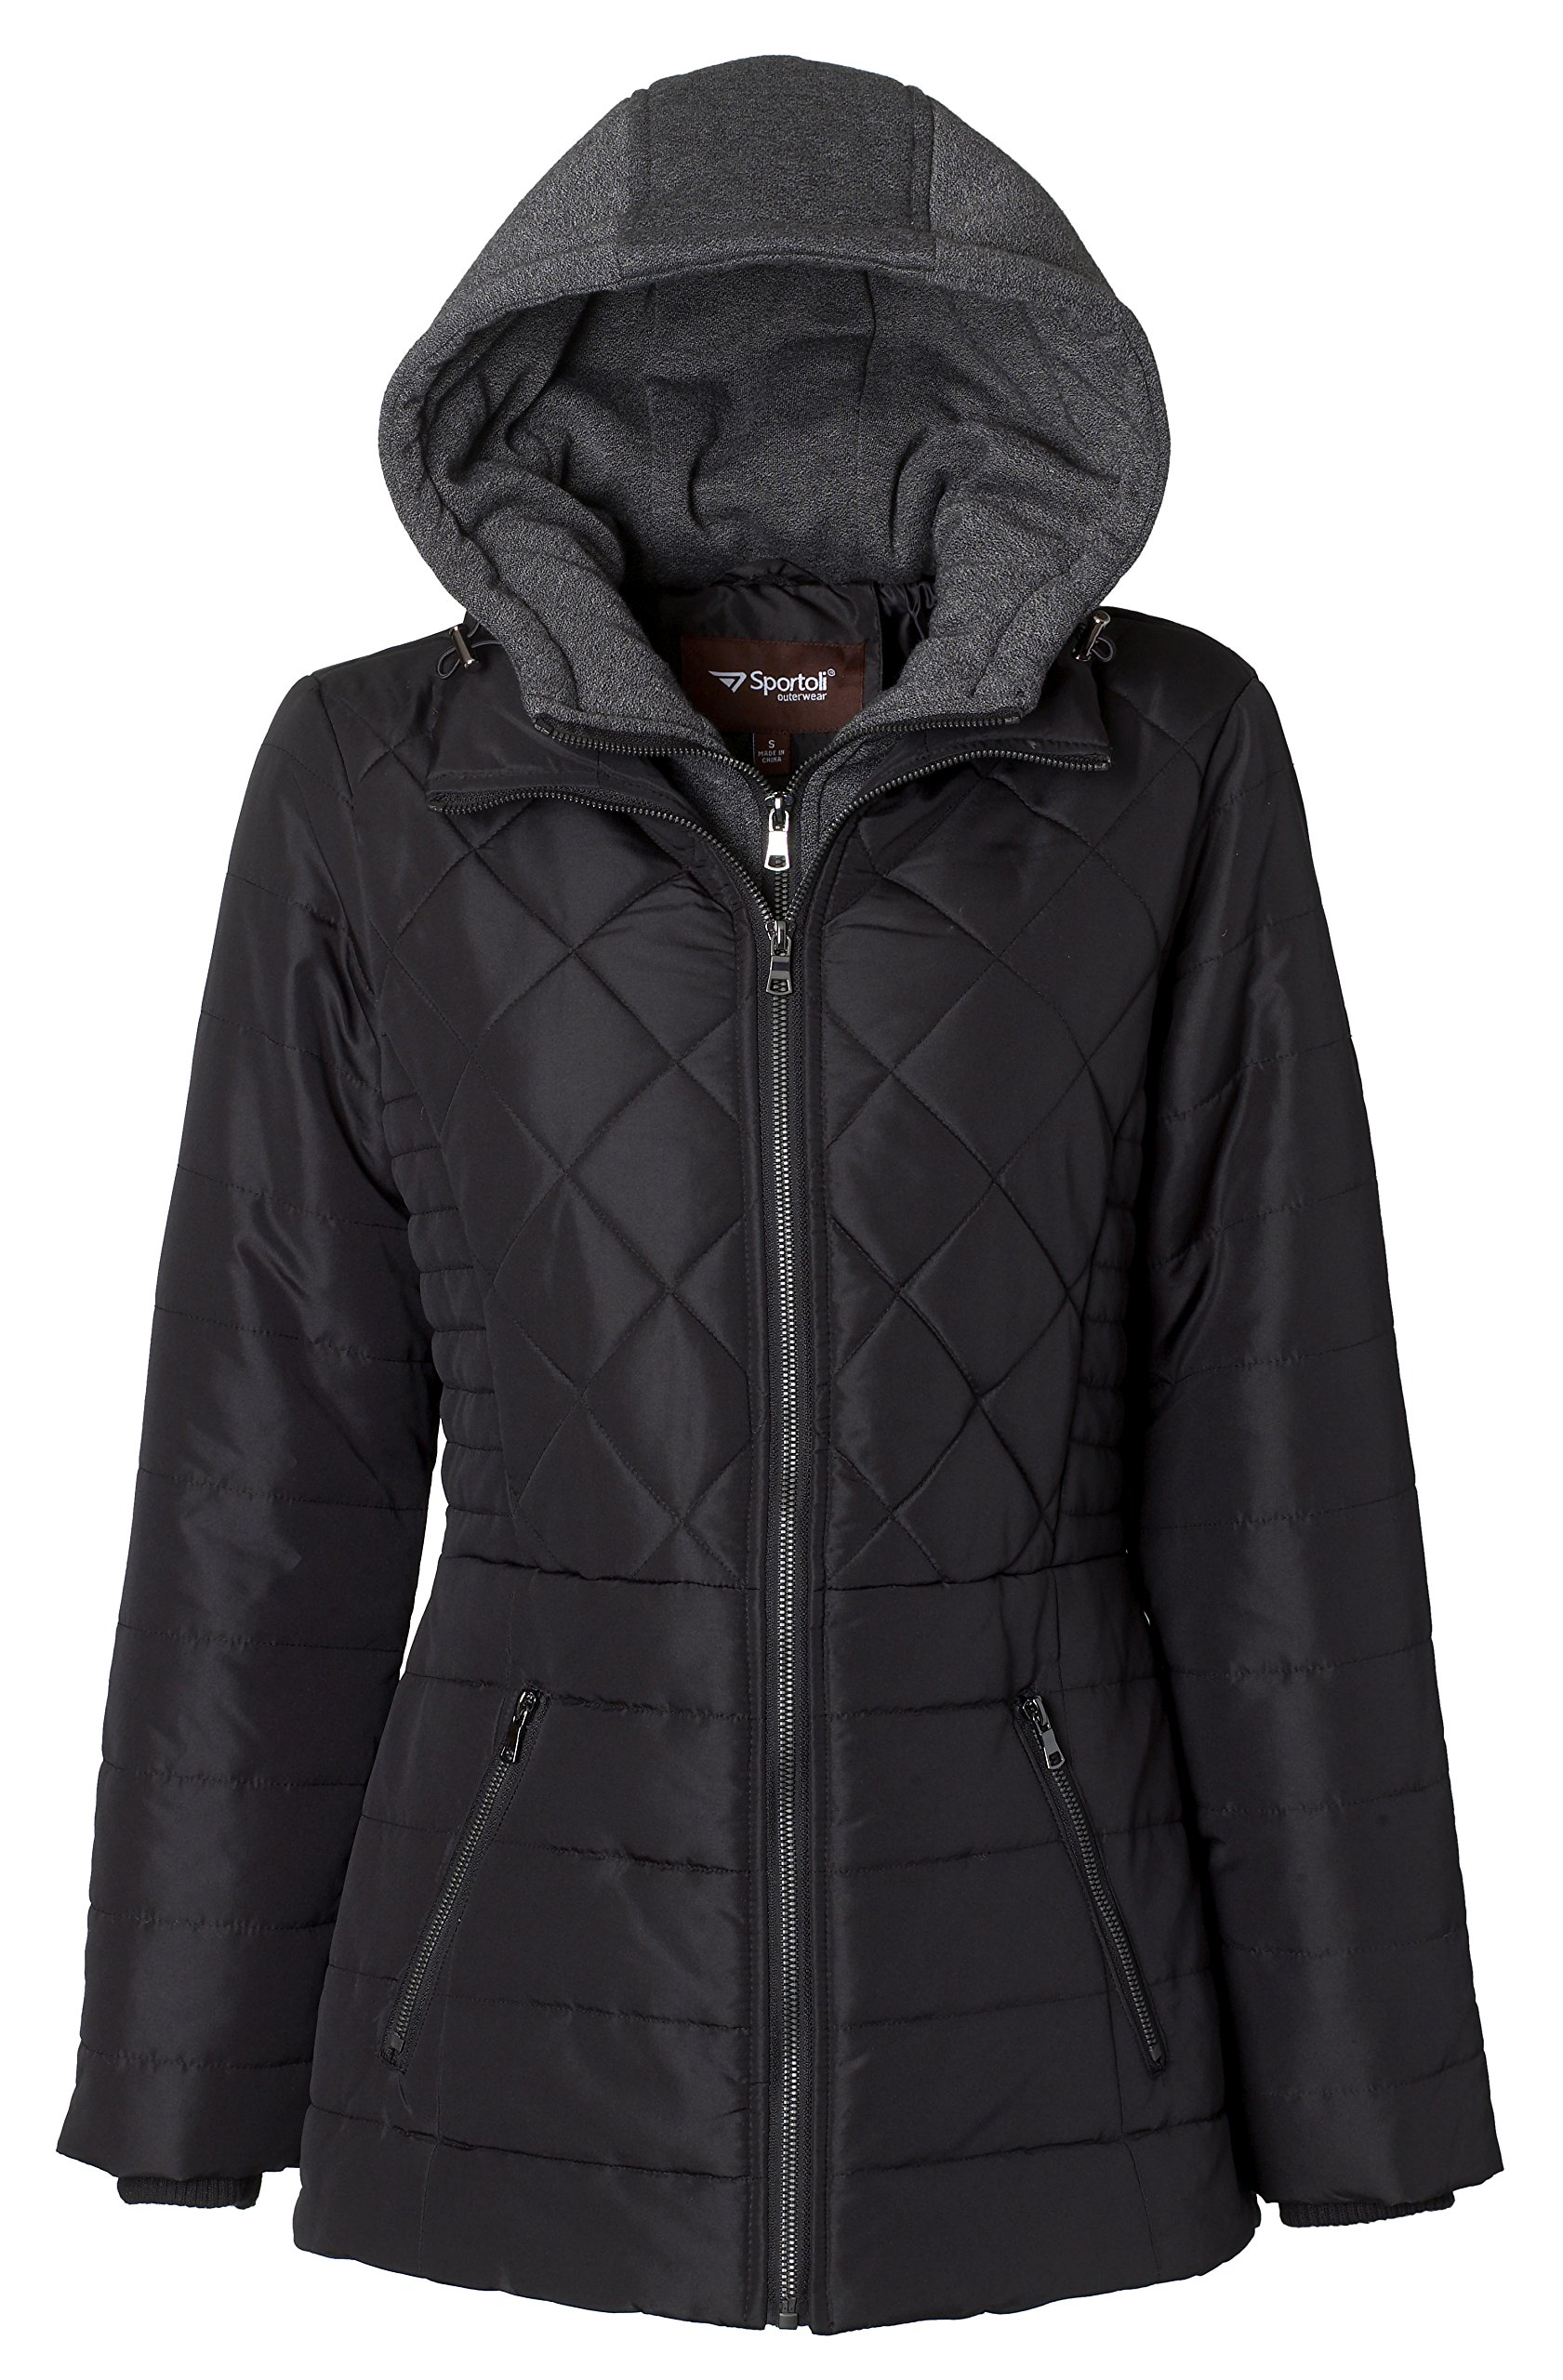 Sportoli Women's Down Alternative Quilted Midlength Vestee Puffer Jacket with Fleece Hood - Black (Small)